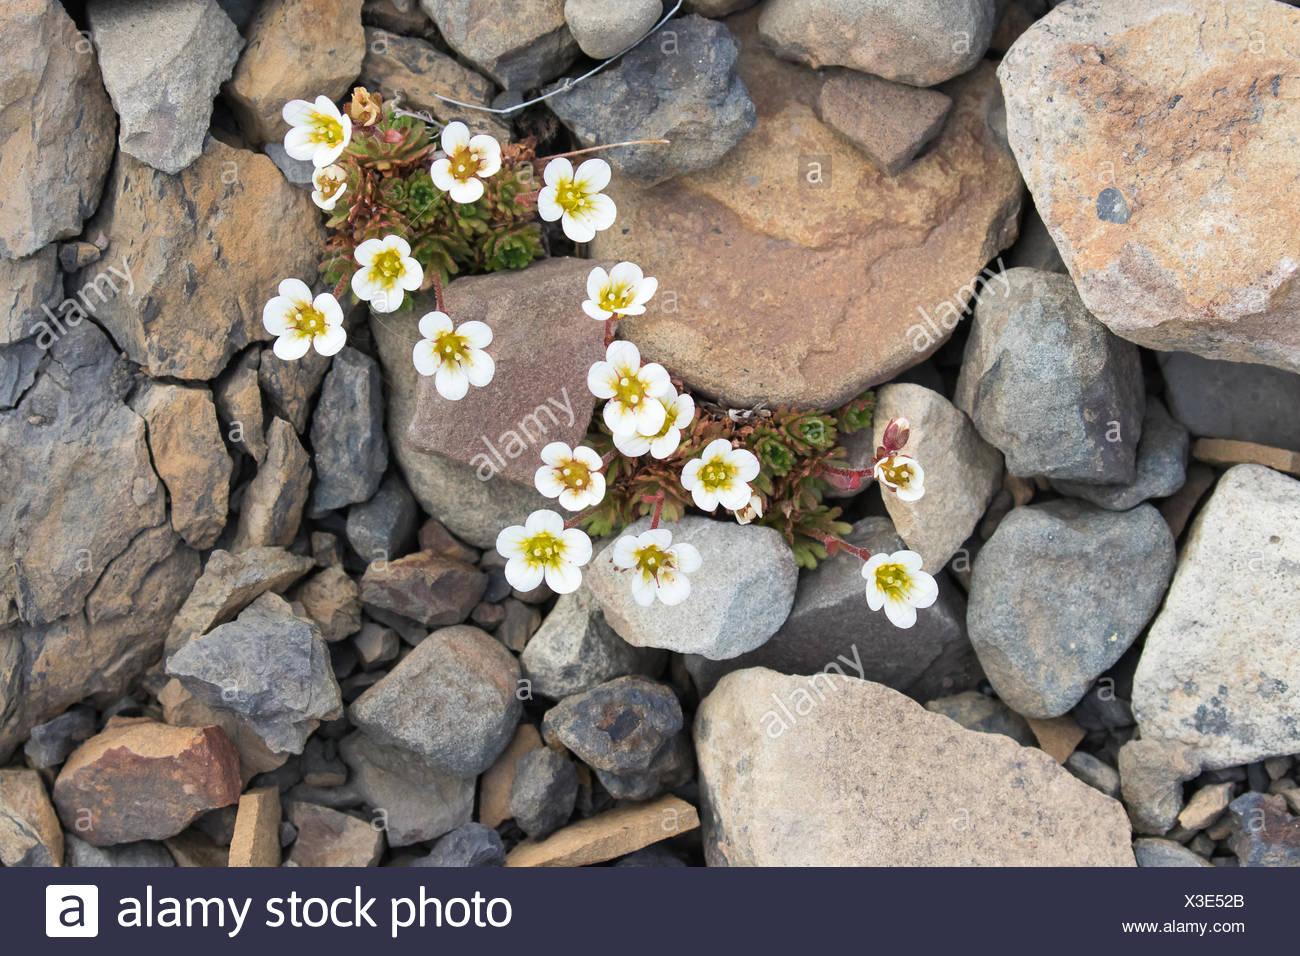 Irish Saxifrage (Saxifraga rosacea), Spitsbergen, Norway Stock Photo